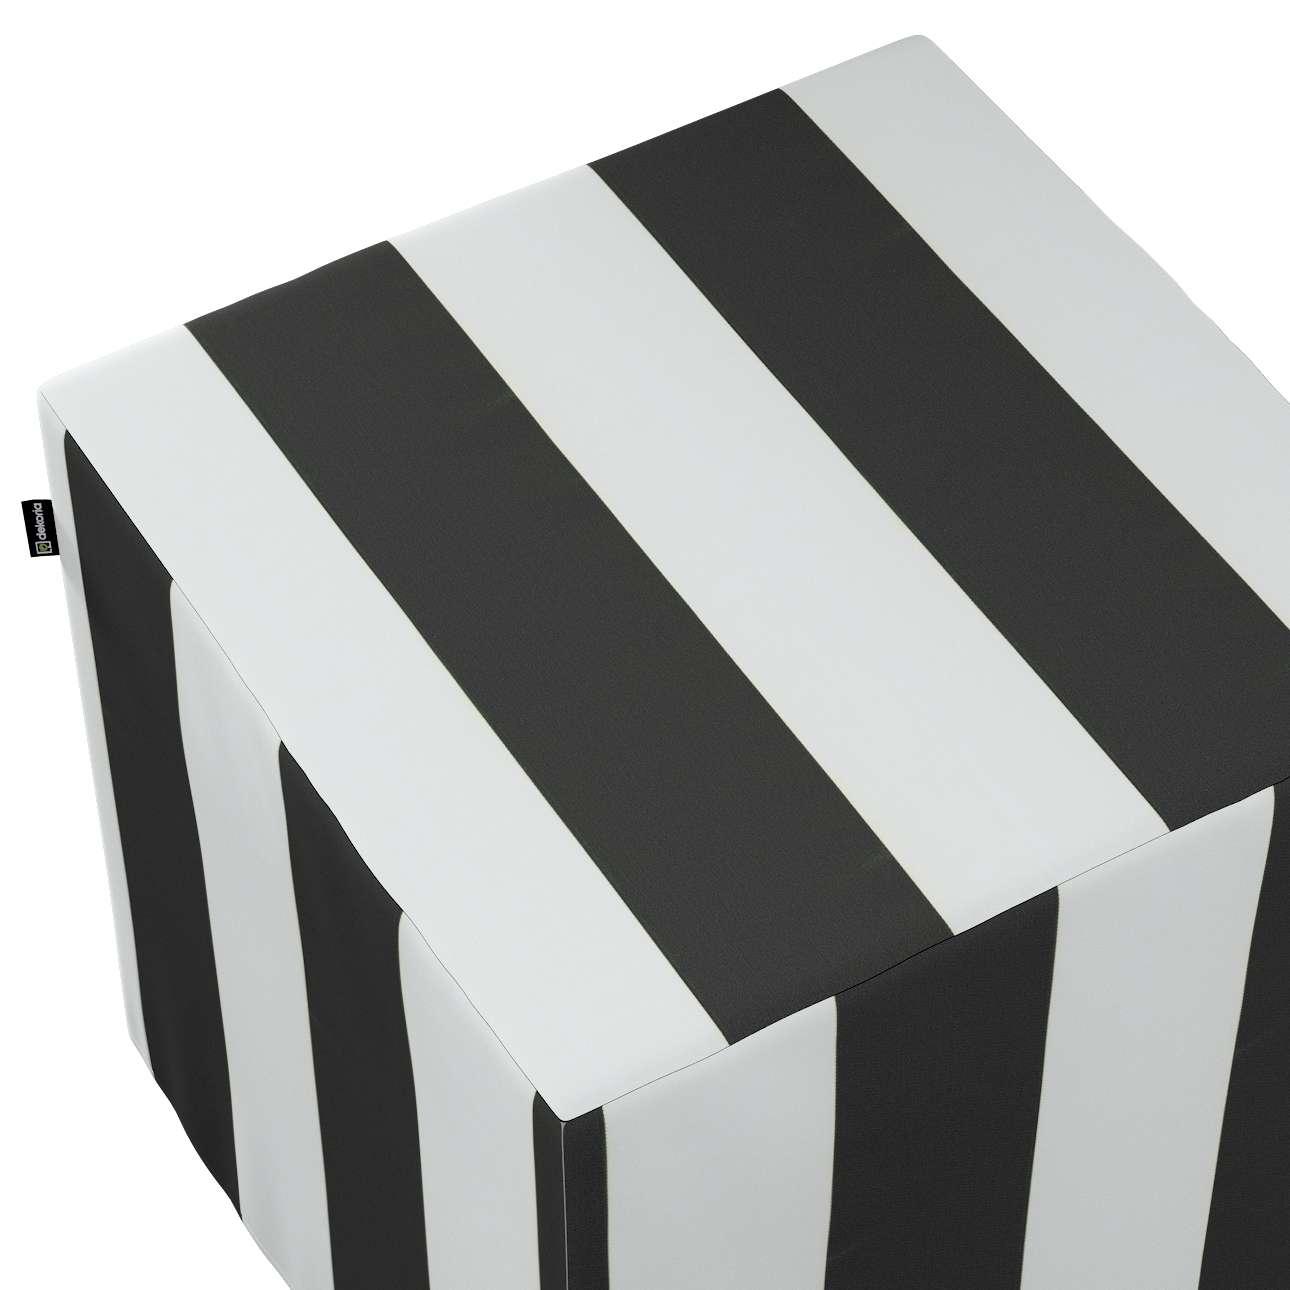 Taburetka tvrdá, kocka V kolekcii Comics, tkanina: 137-53